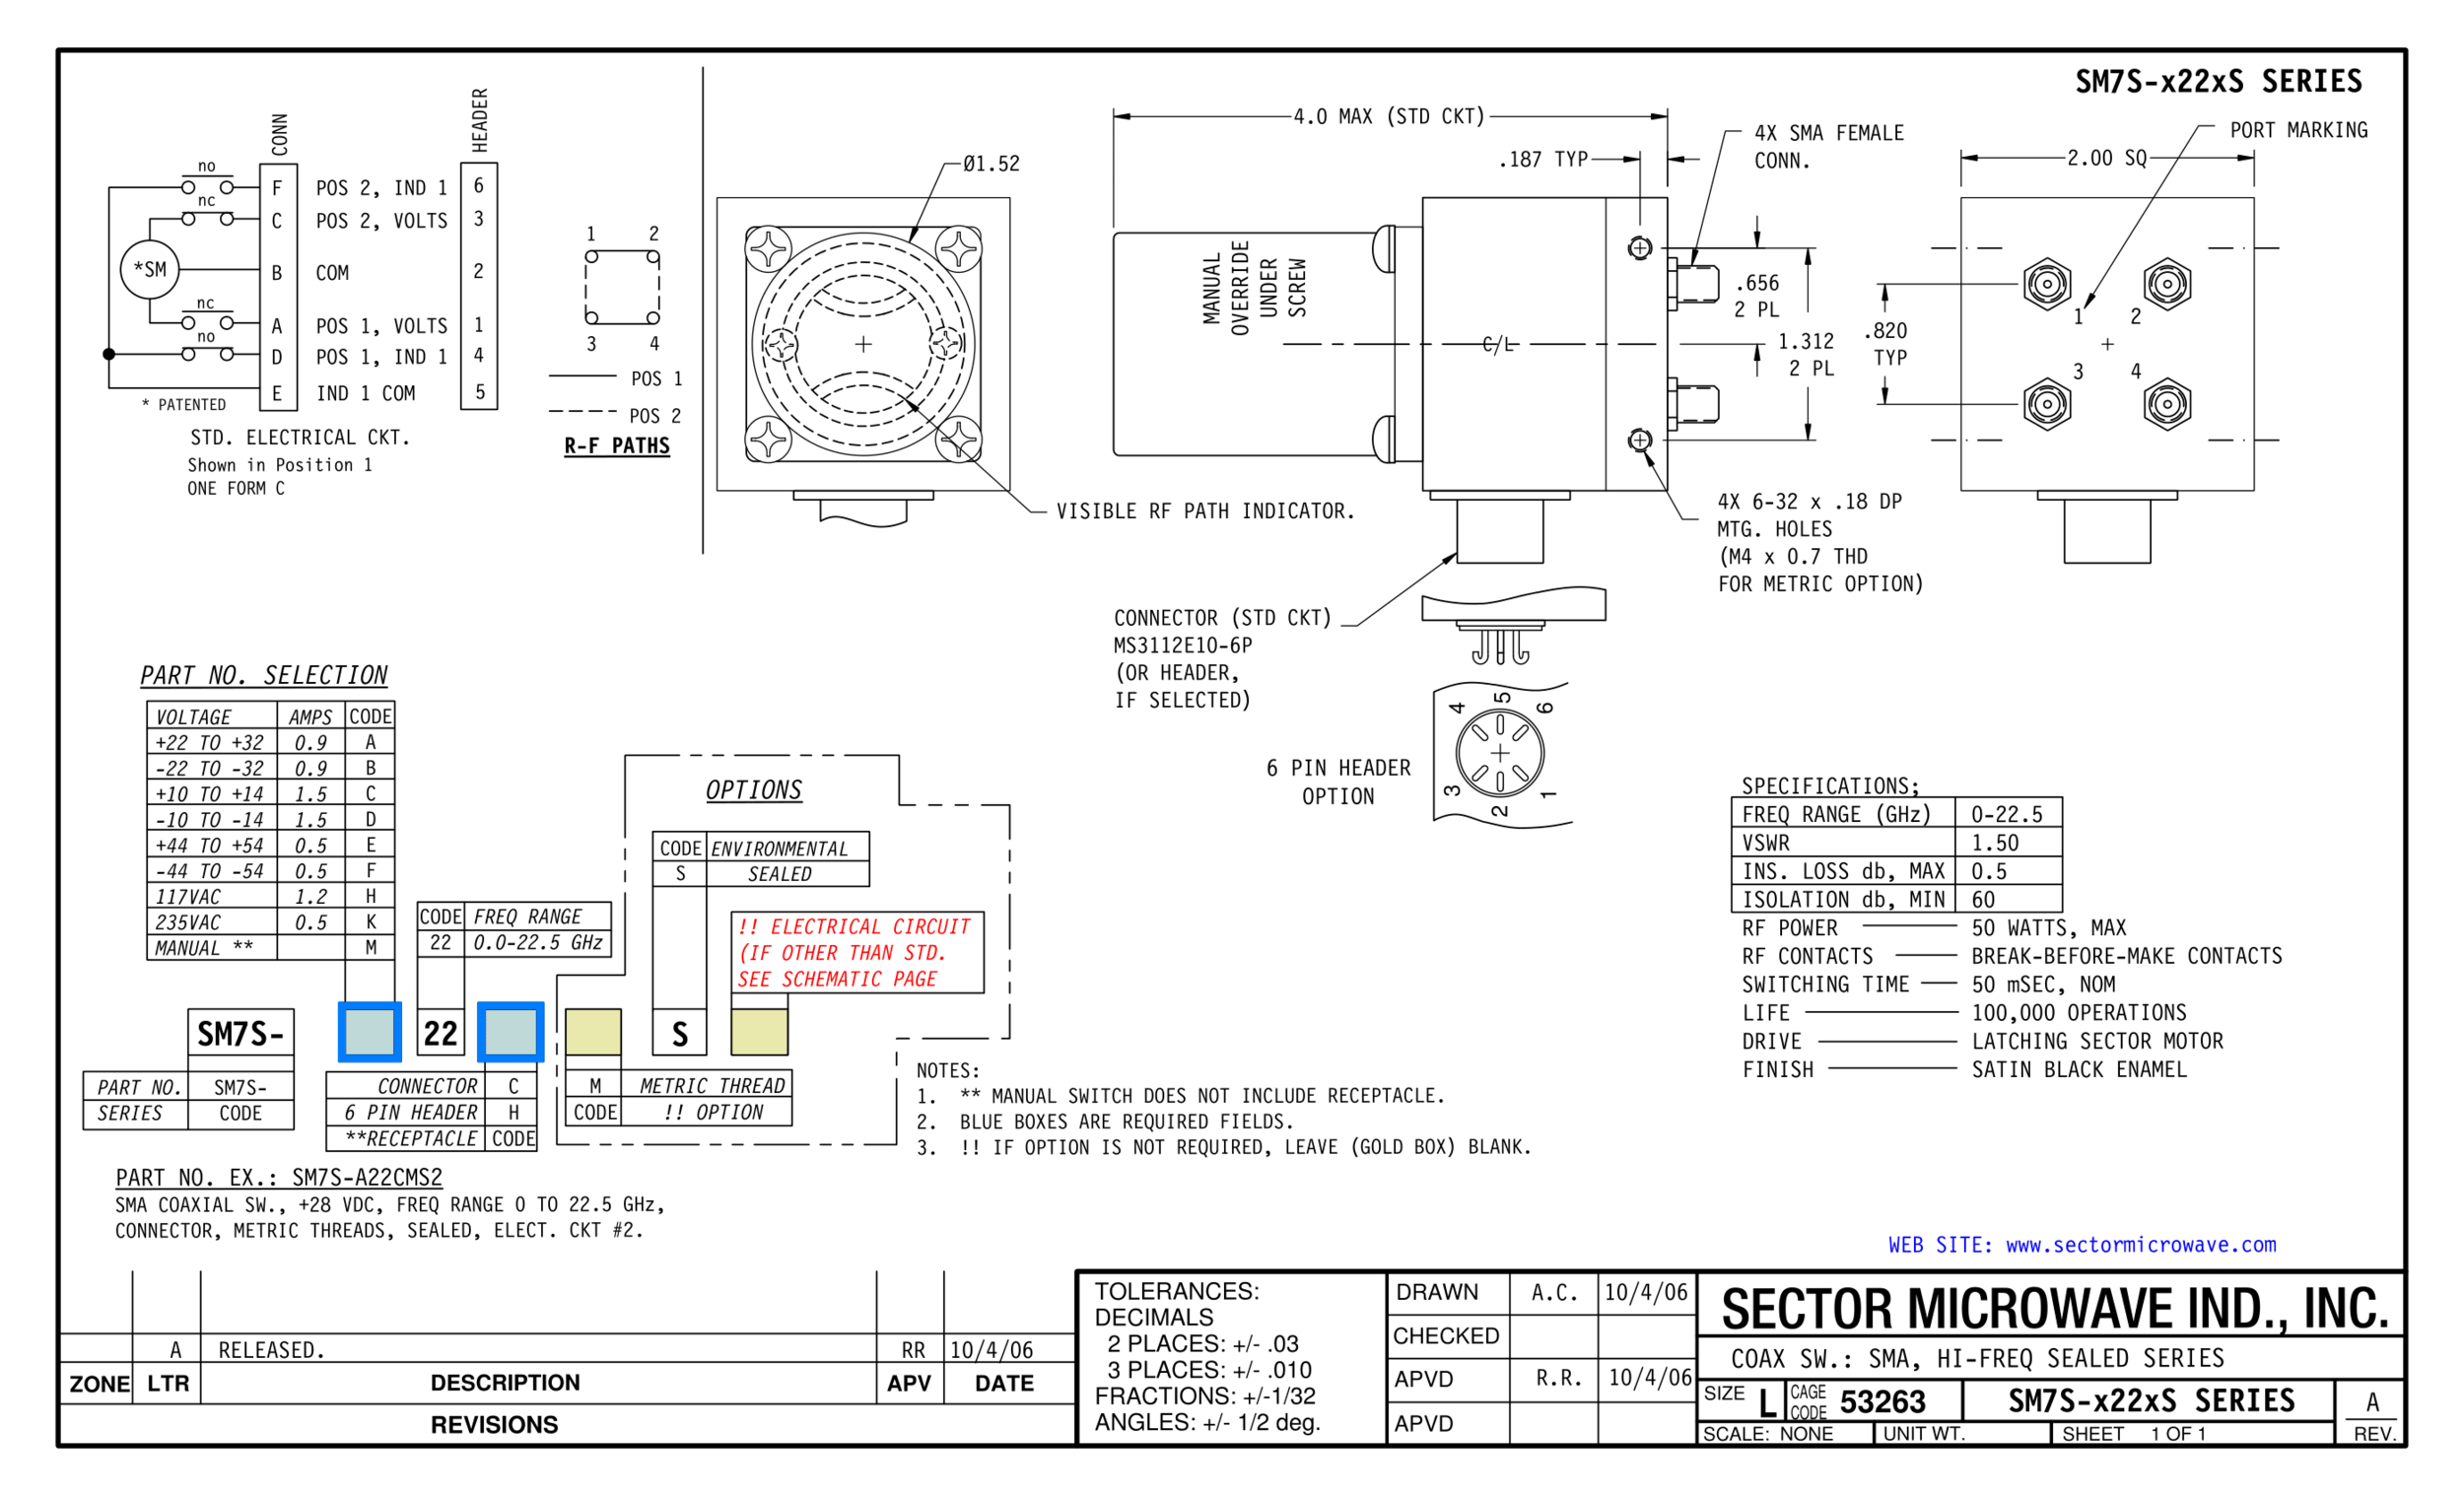 SM7N Wideband Sealed